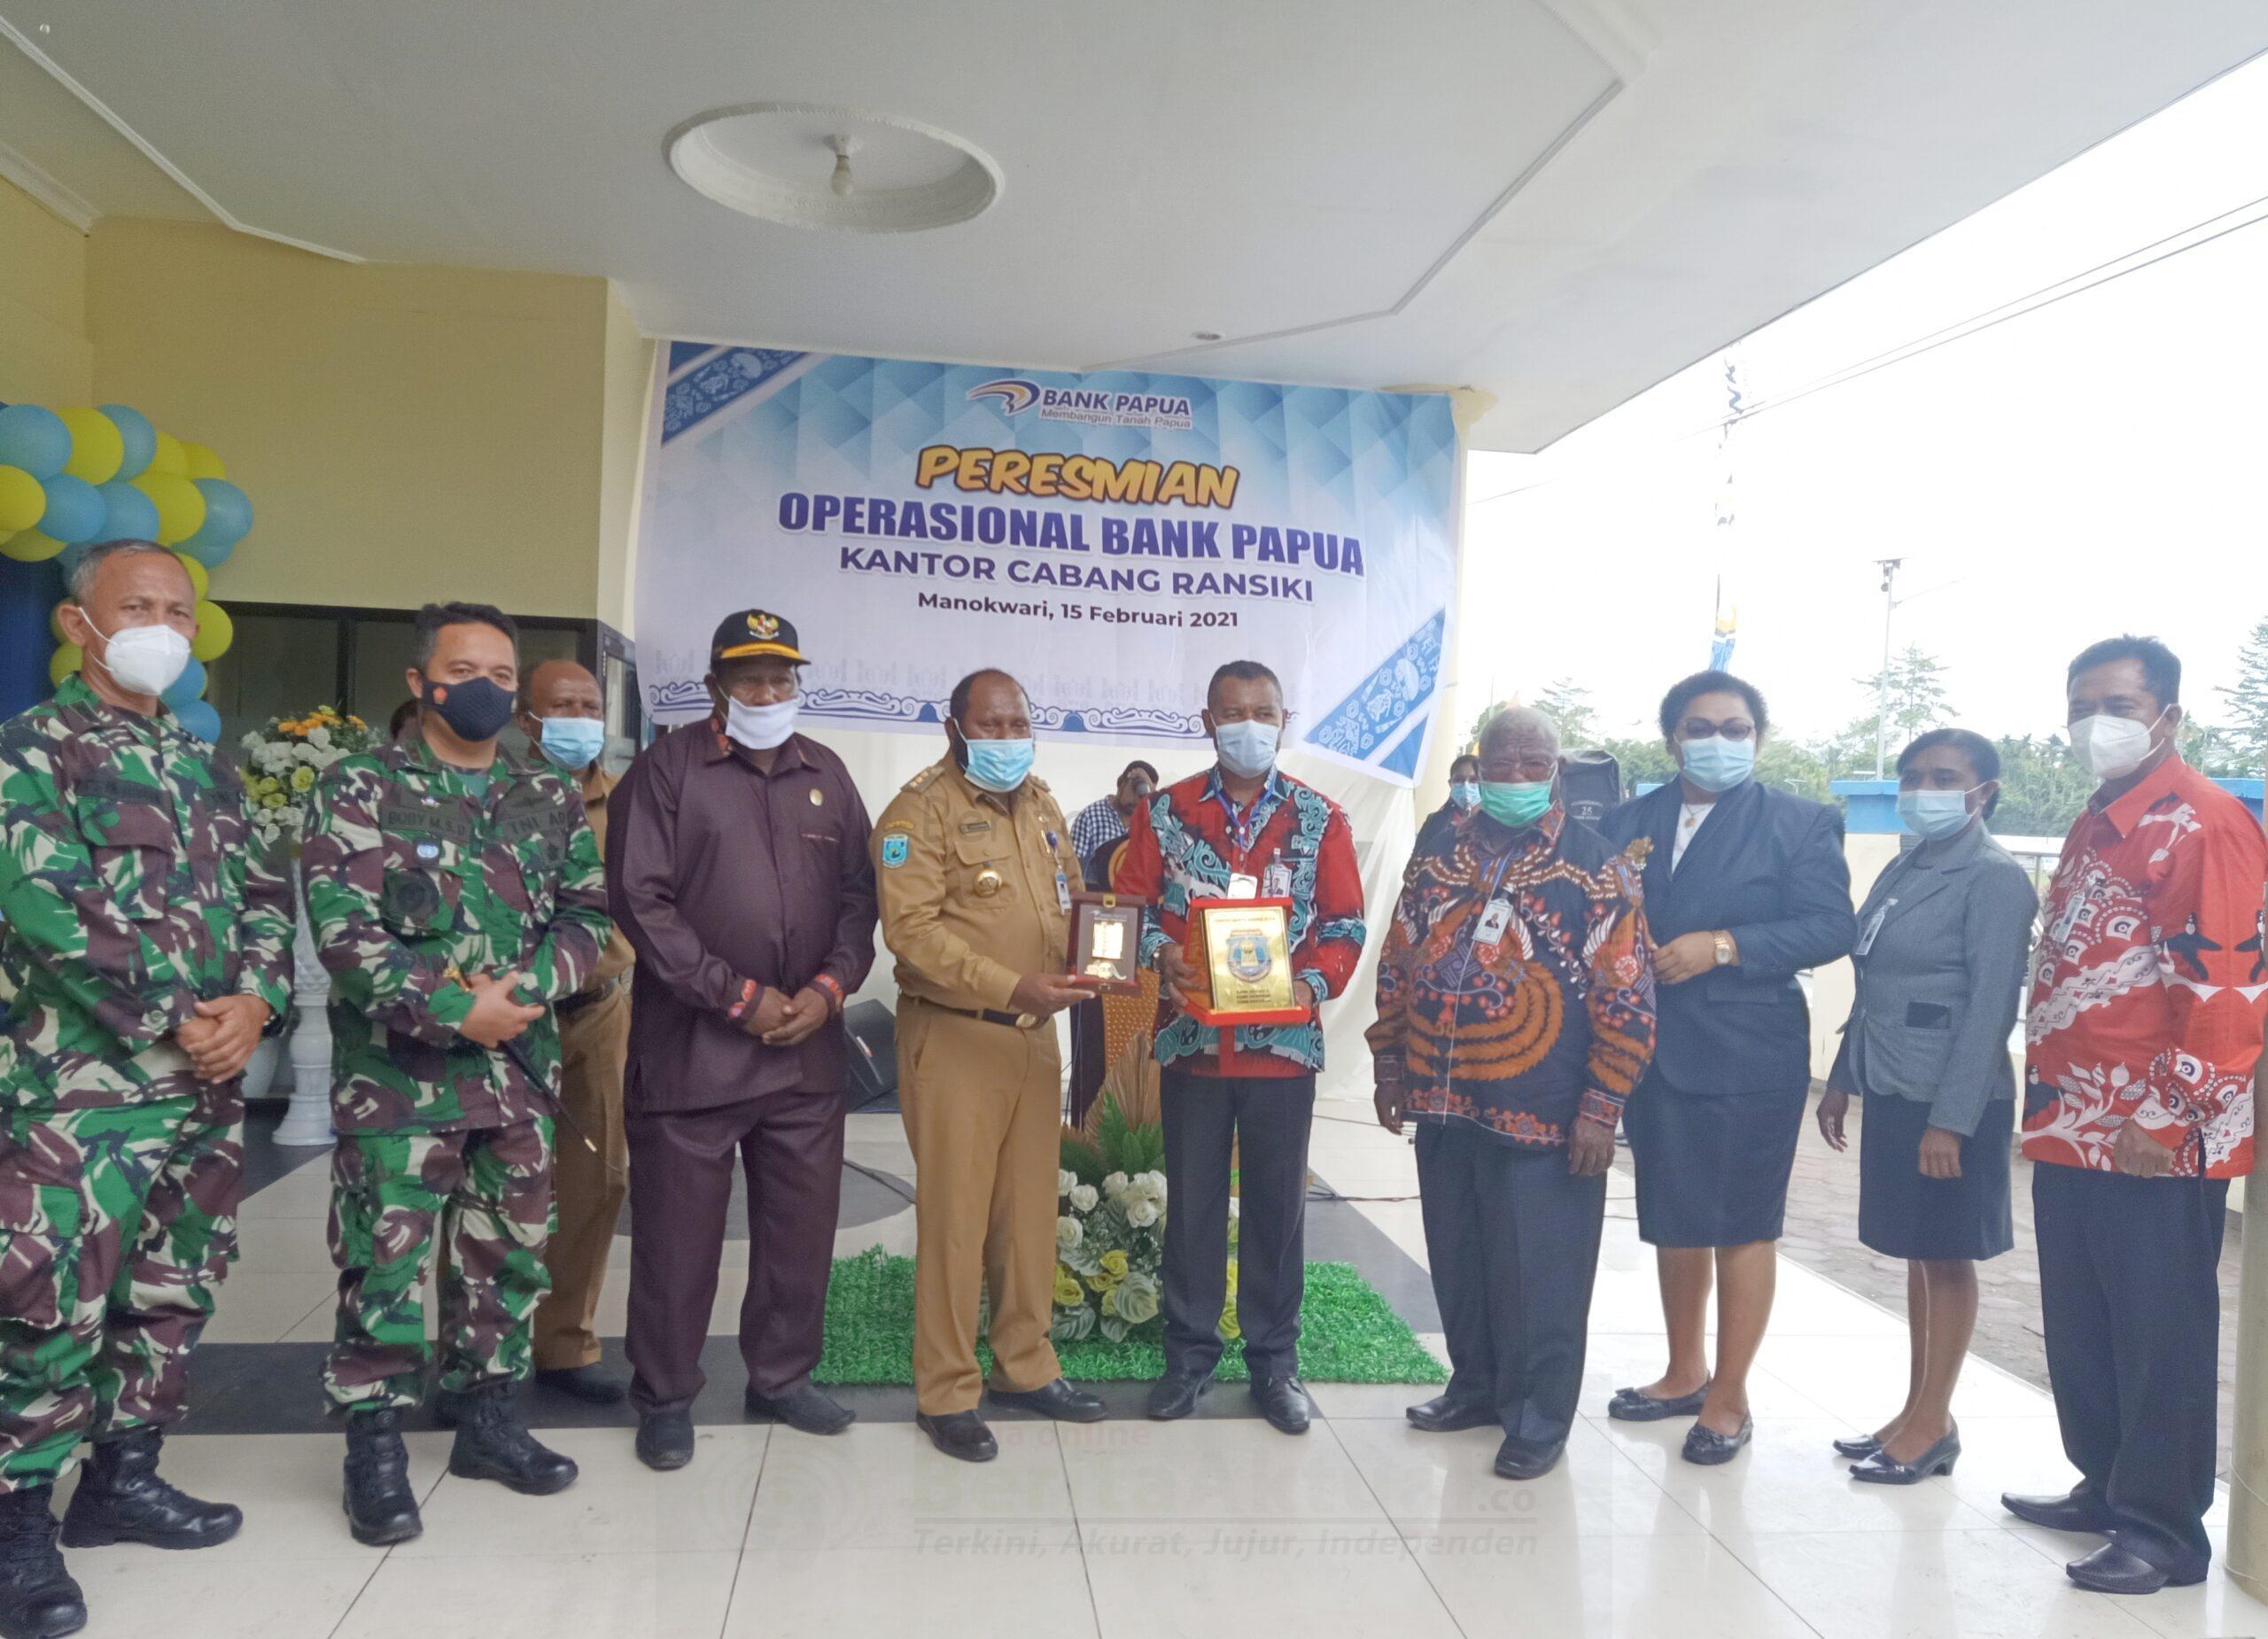 Bupati Manokwari Selatan, Resmikan KCP Ransiki Menjadi Kantor Cabang Bank Papua 10 IMG 20210215 224557 scaled